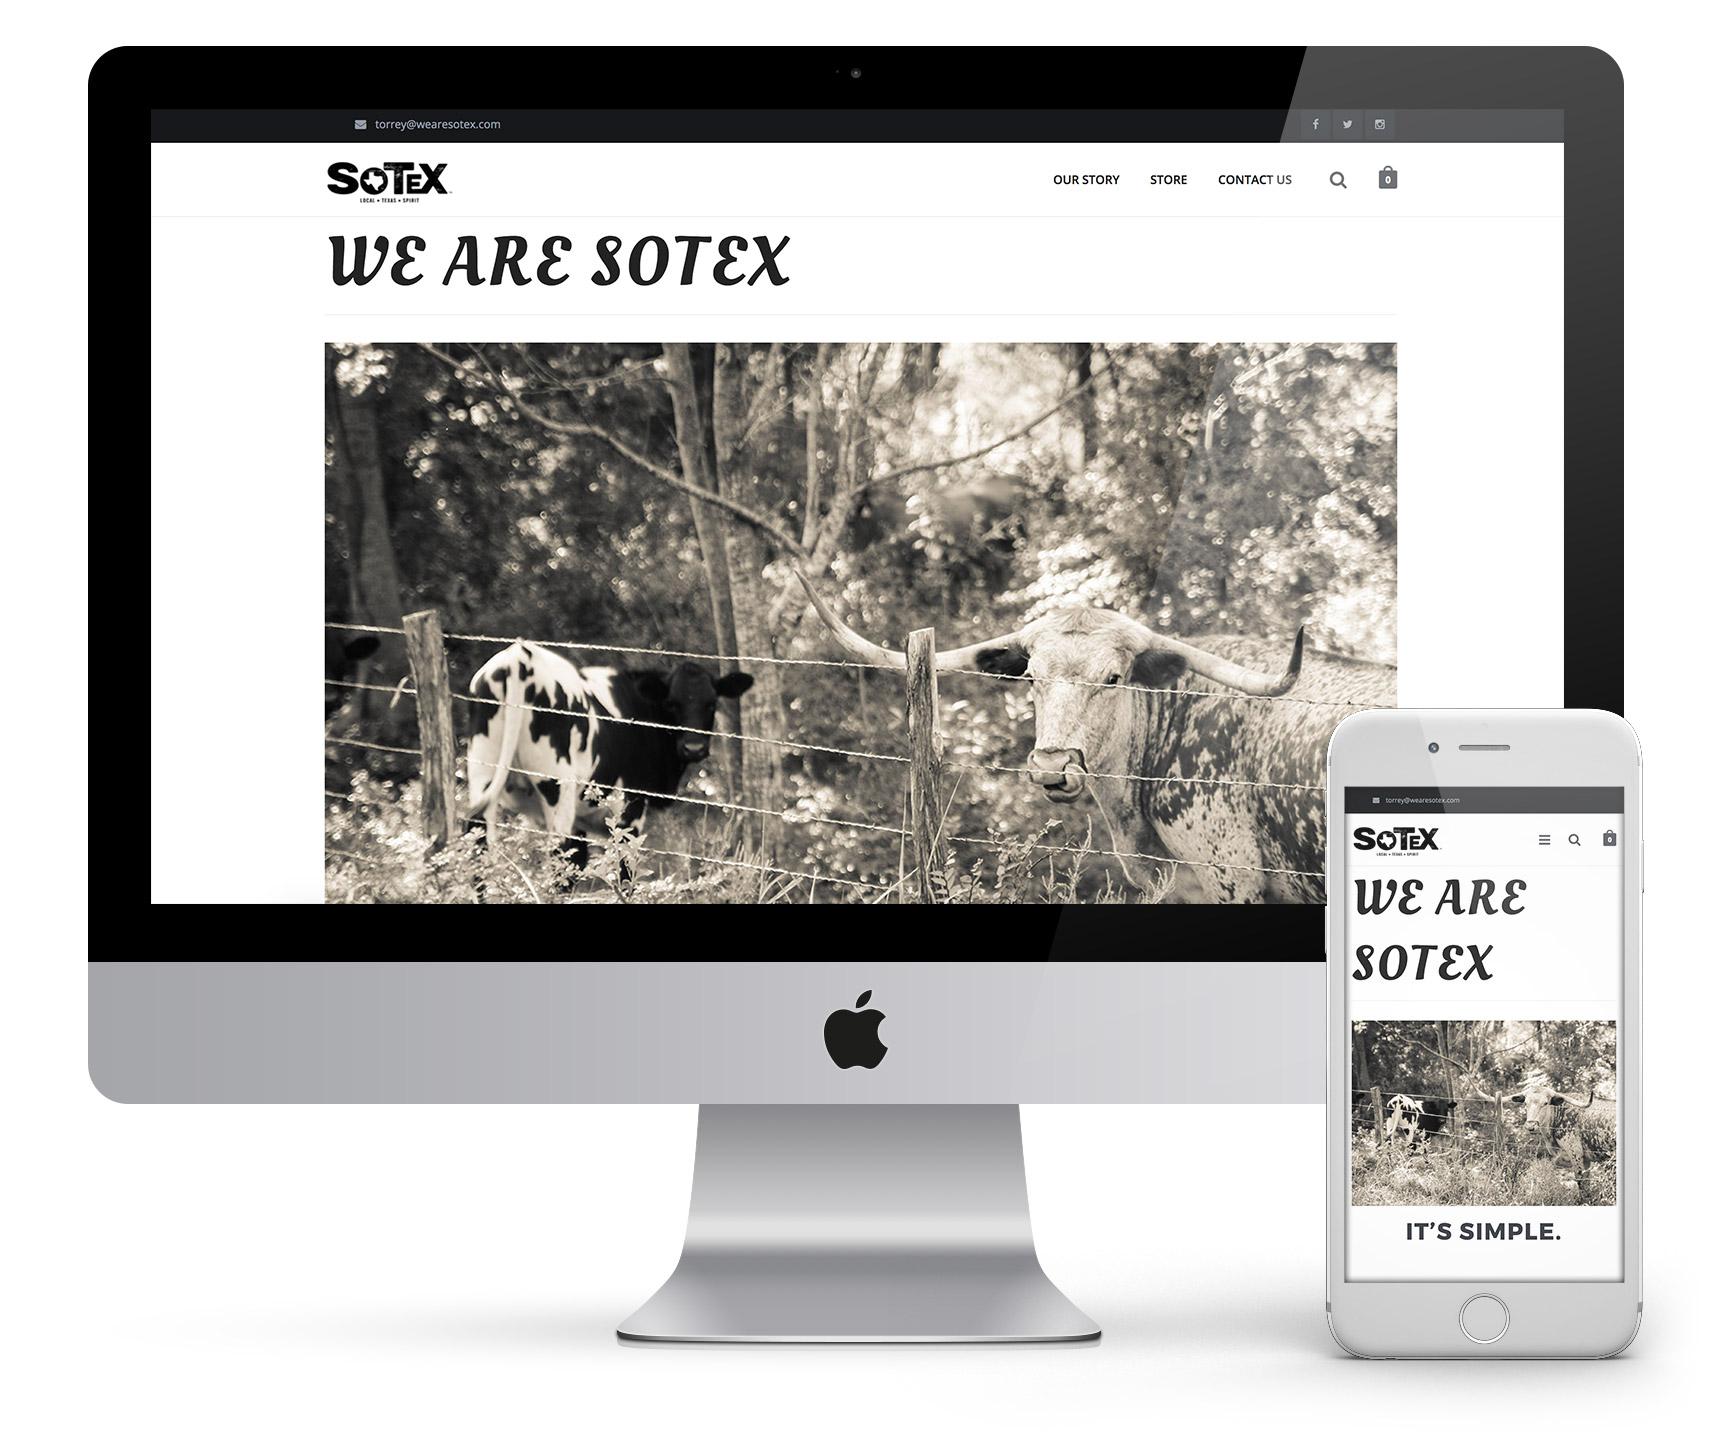 SOTEX Online Store